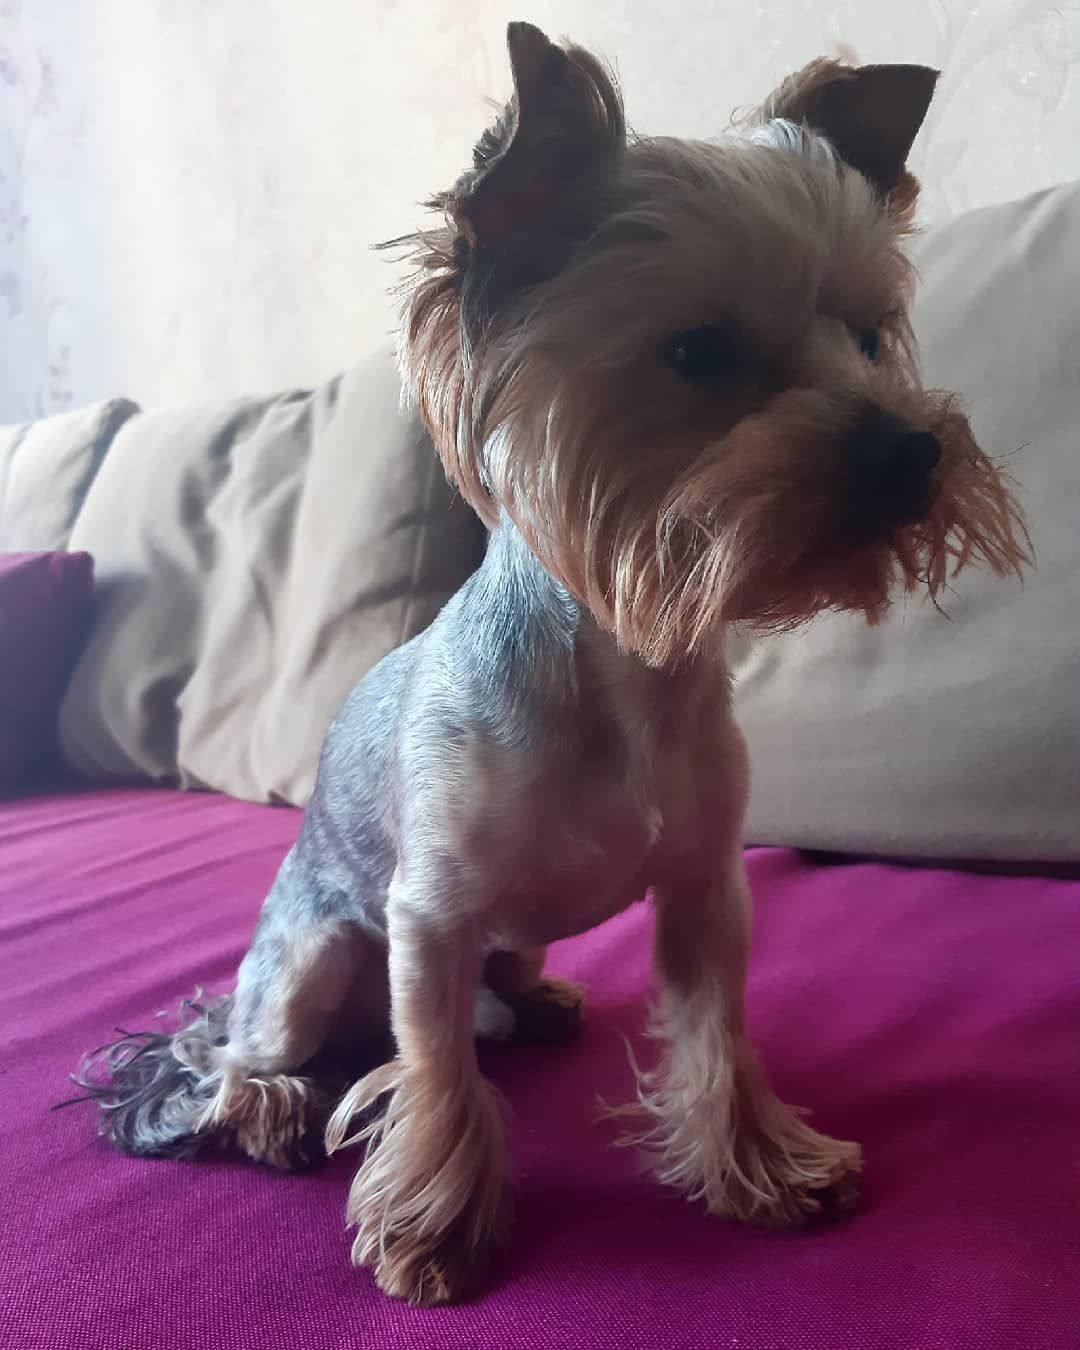 .... #dog #dogsofinstagram #dogs #puppy #dogstagram #instadog #pet #doglover #love #dogoftheday #cute #doglovers #instagram #pets #of #puppylove #doggo #puppies #cat #doglife #puppiesofinstagram #ilovemydog #dogsofinsta #animals #hund #doggy #petstagram #k #animal